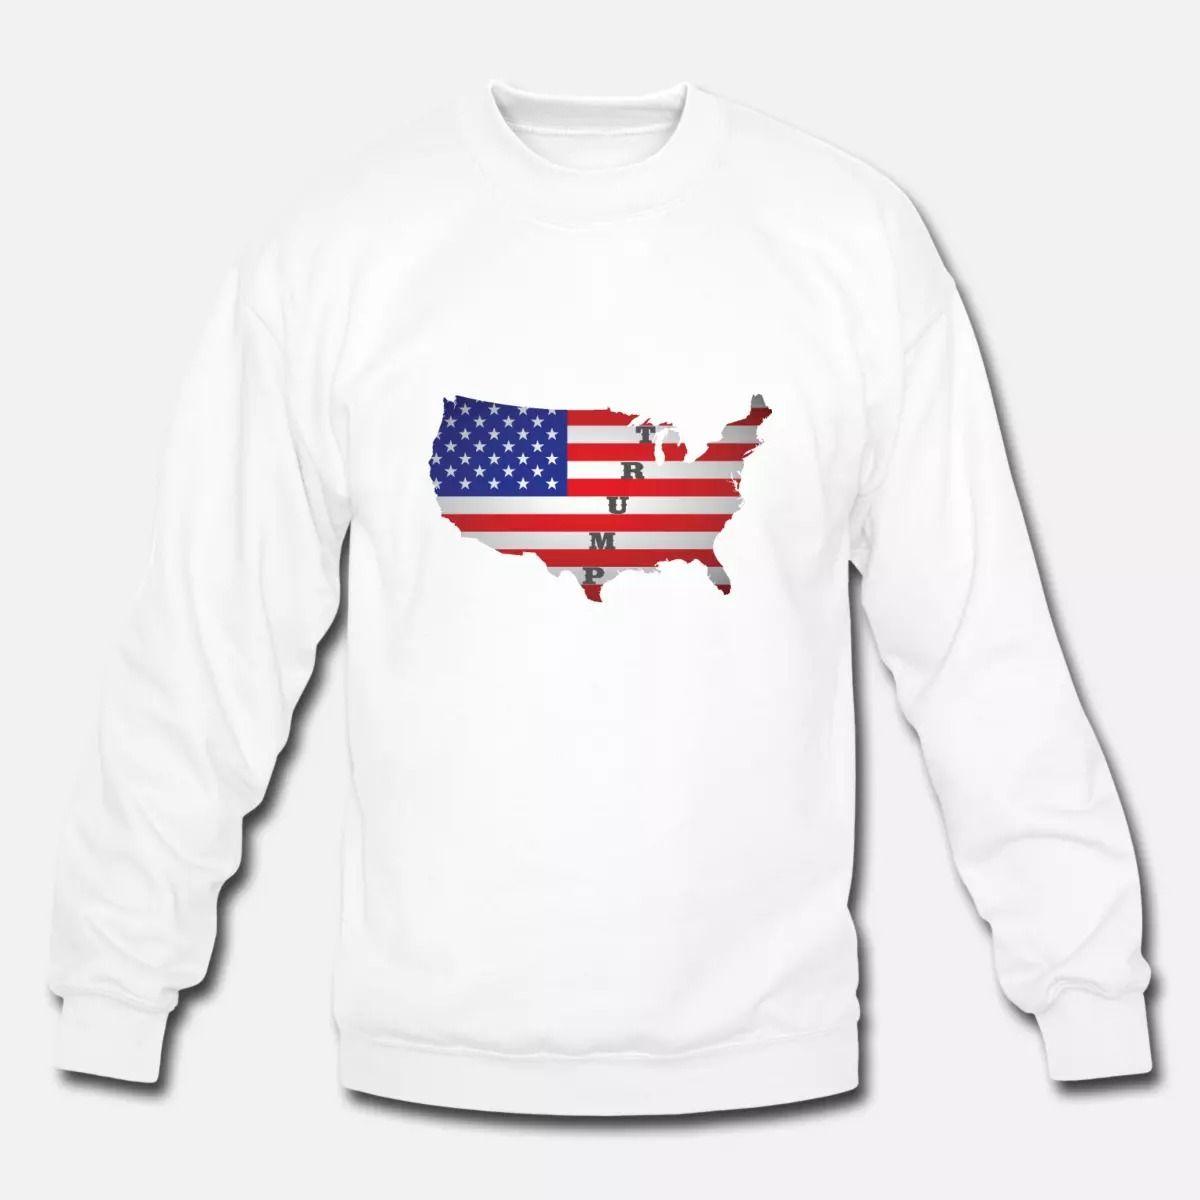 American Flag Trump Unisex Crewneck Sweatshirt Spreadshirt Long Sleeve Tshirt Men Crew Neck Sweatshirt Sweatshirts [ 1200 x 1200 Pixel ]